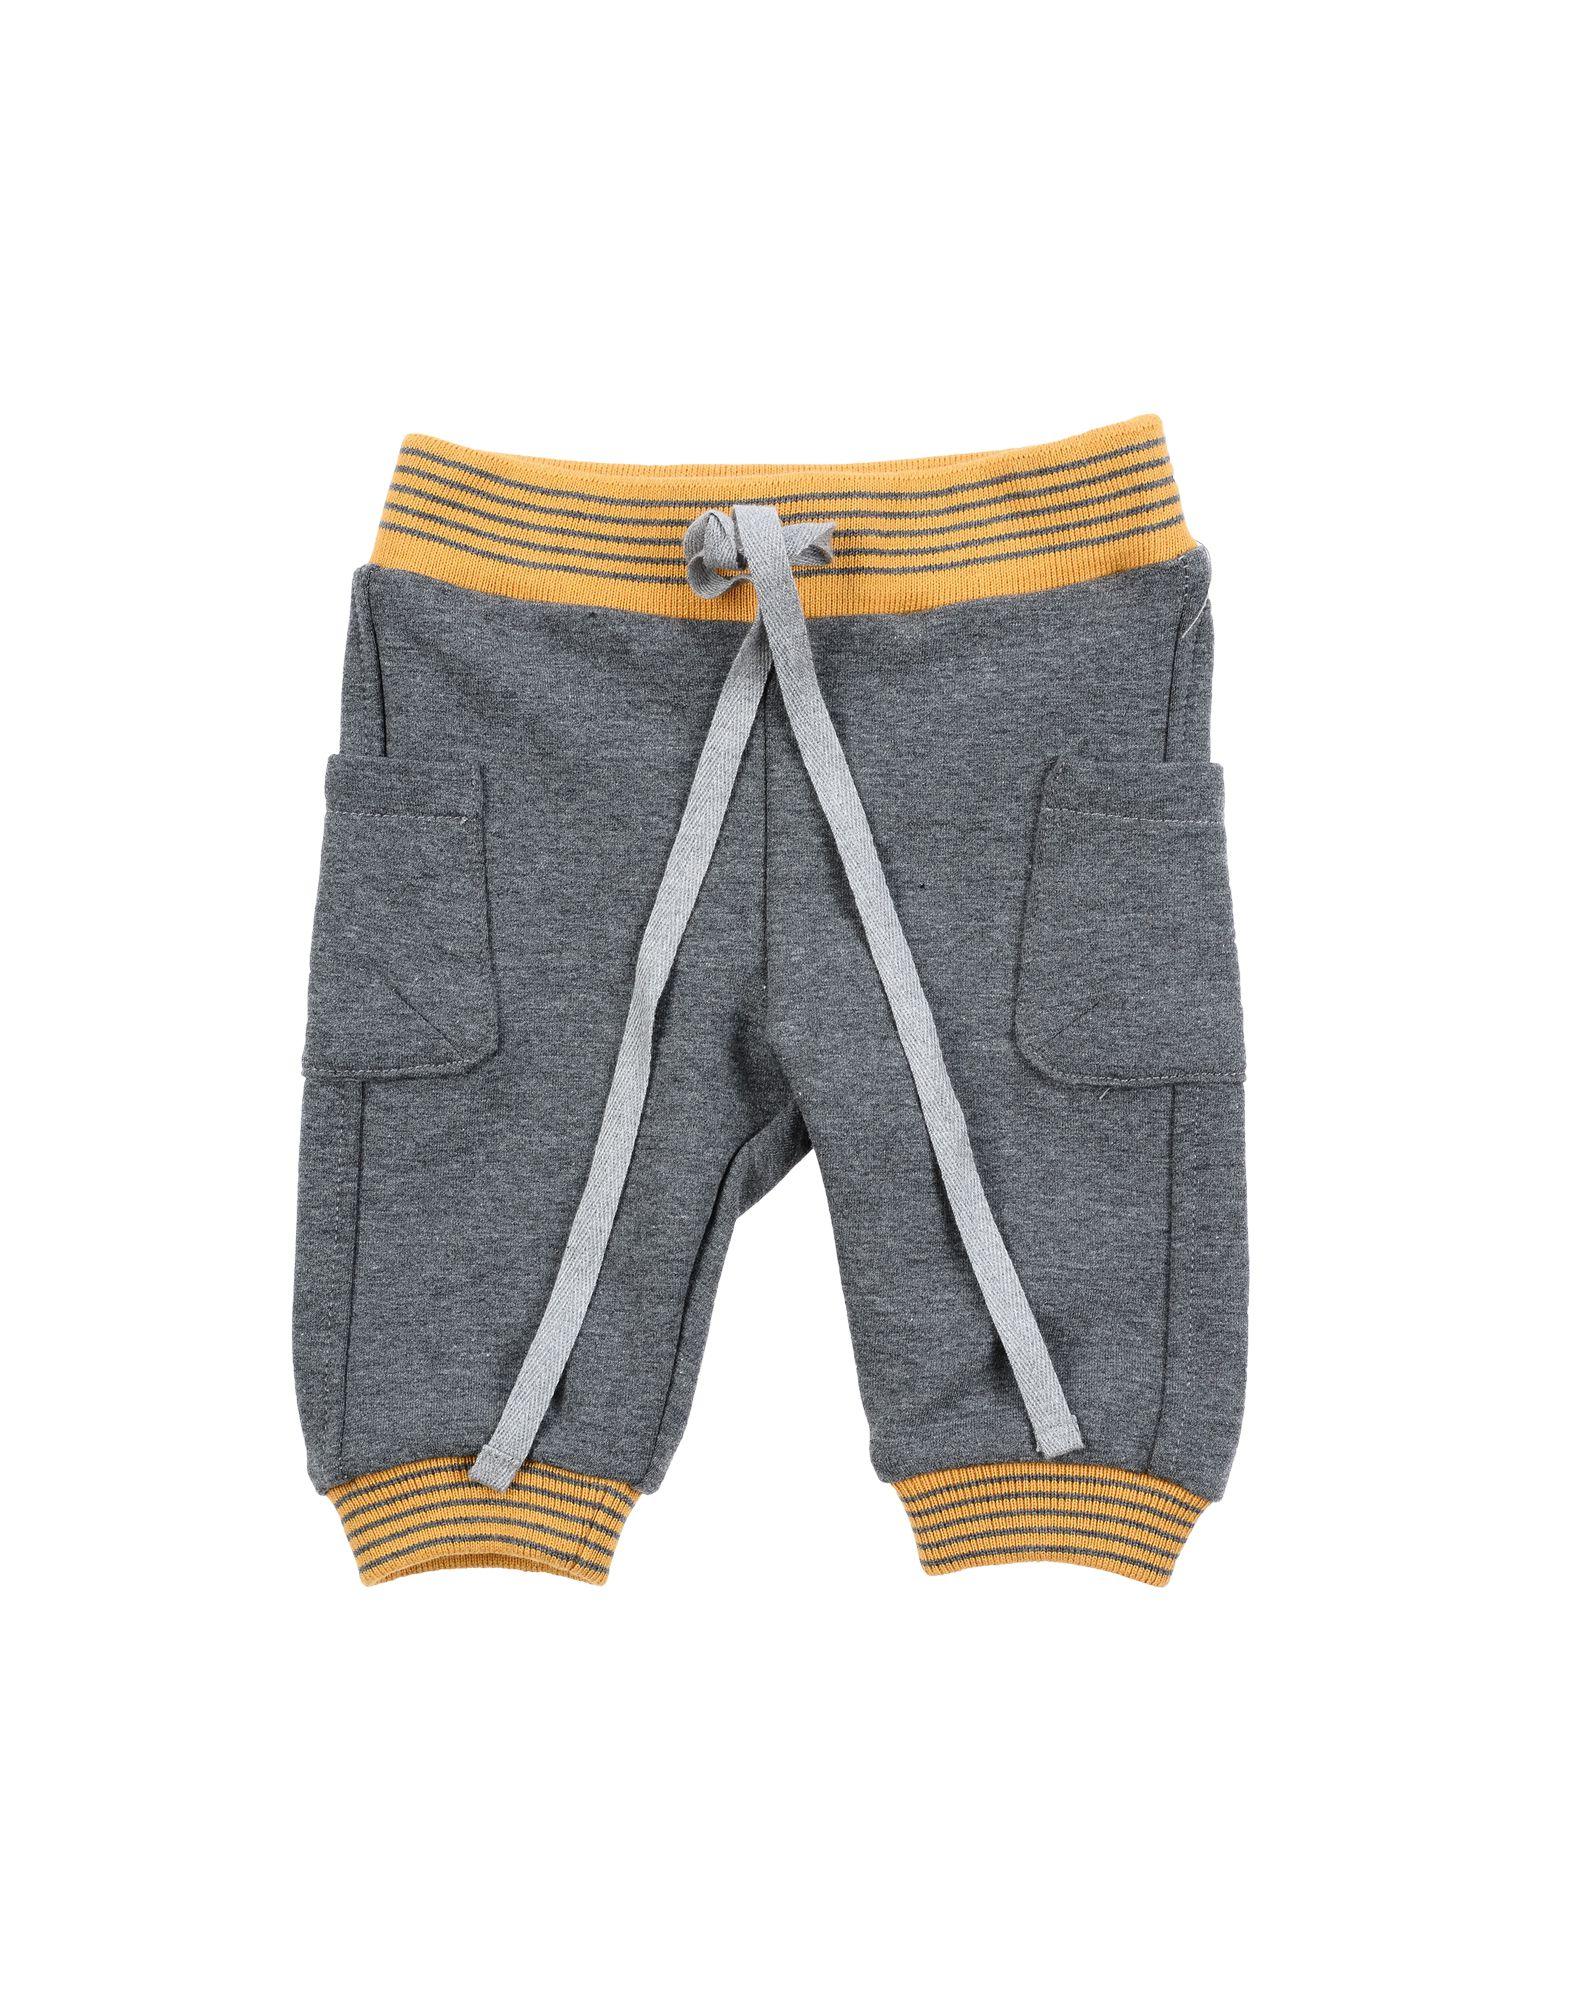 Leo E Lilly Bon Ton Kids' Casual Pants In Gray